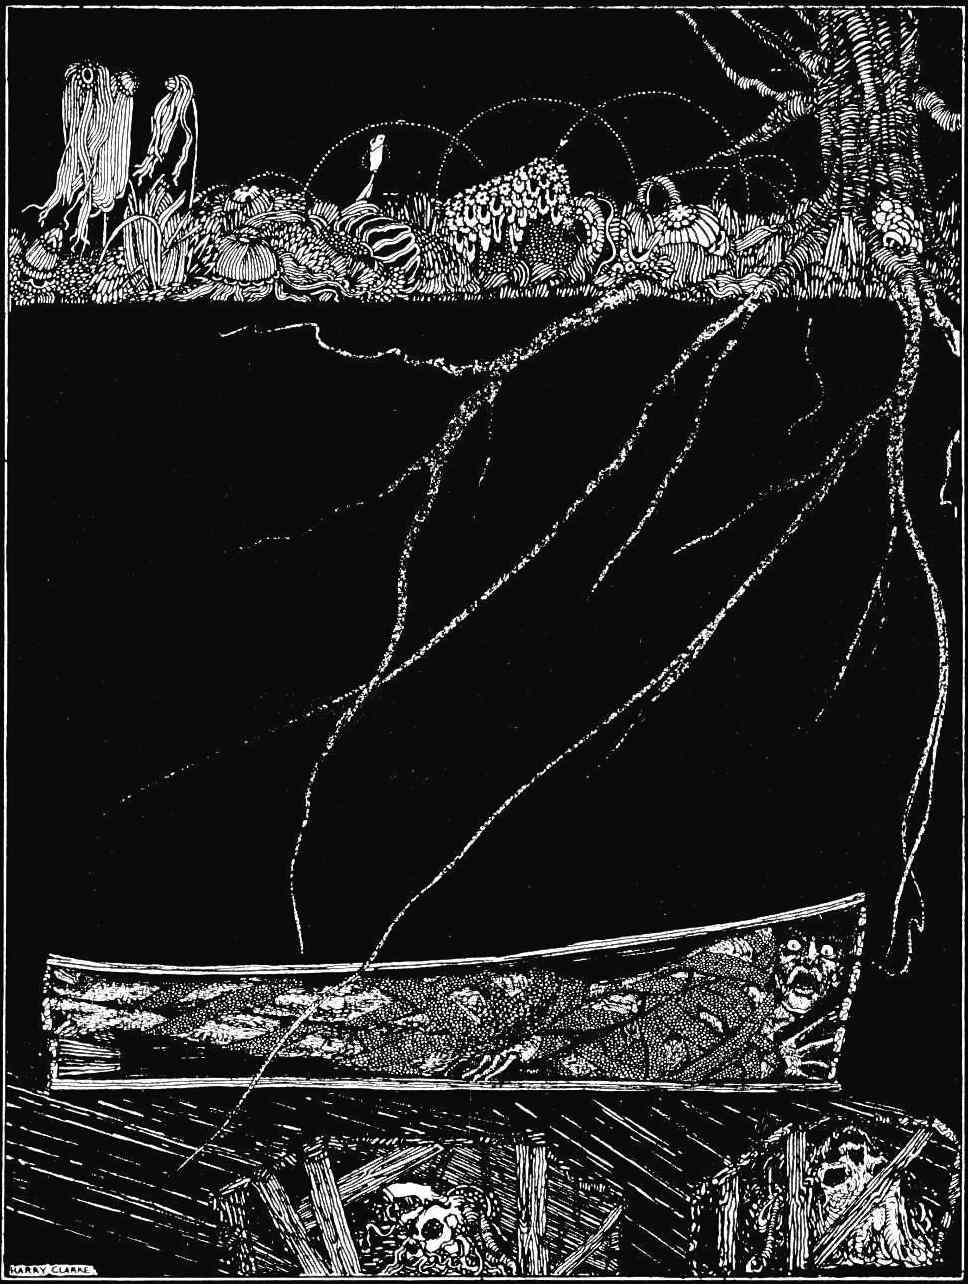 a Harry Clarke illustration for Poe